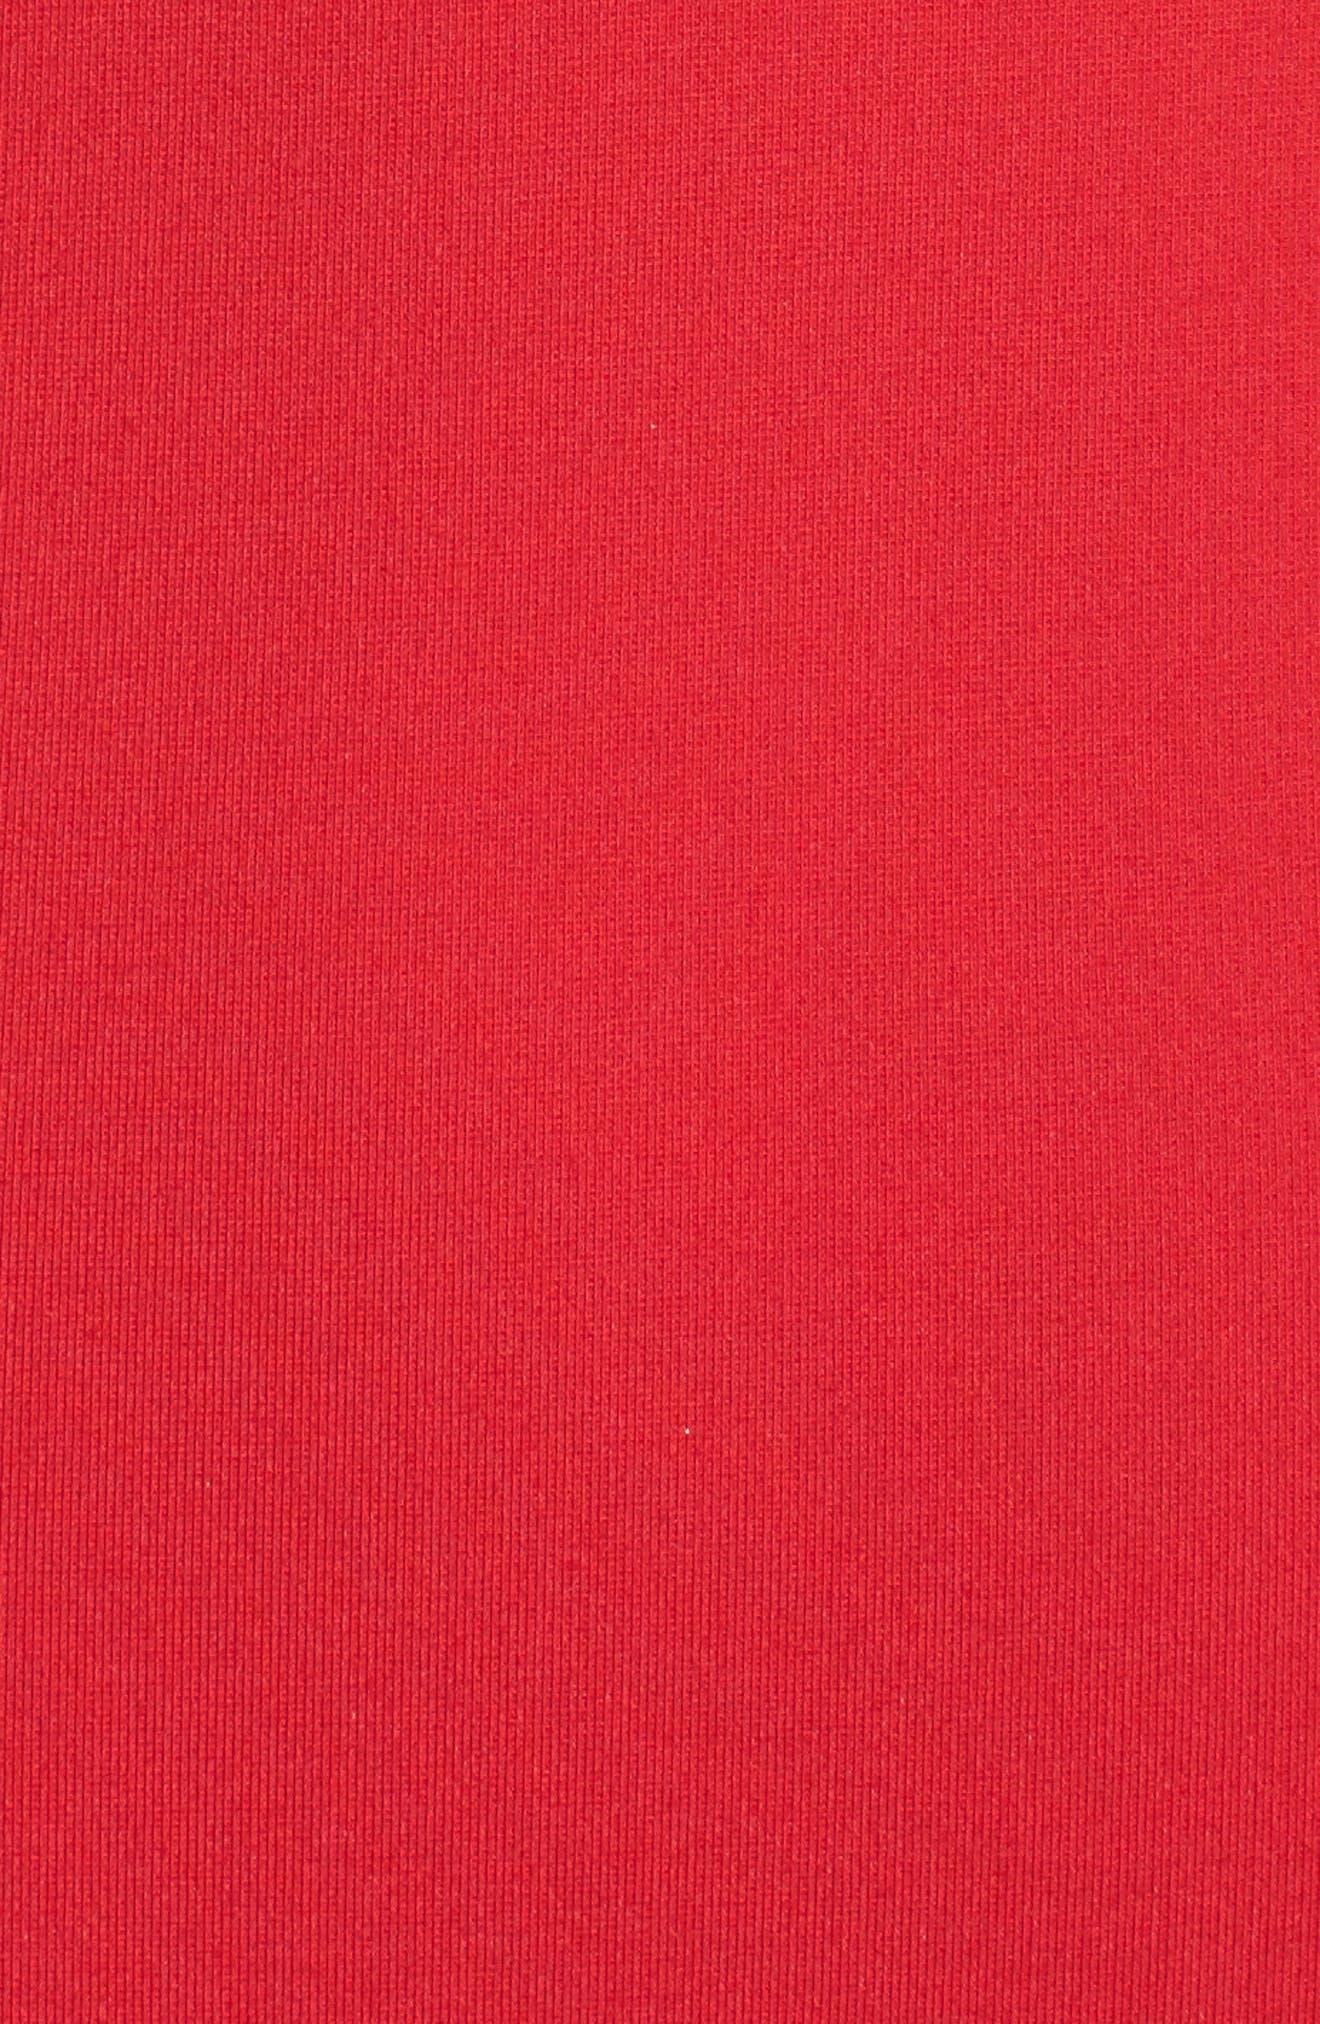 Socialite Ponte Halter Sheath Dress,                             Alternate thumbnail 10, color,